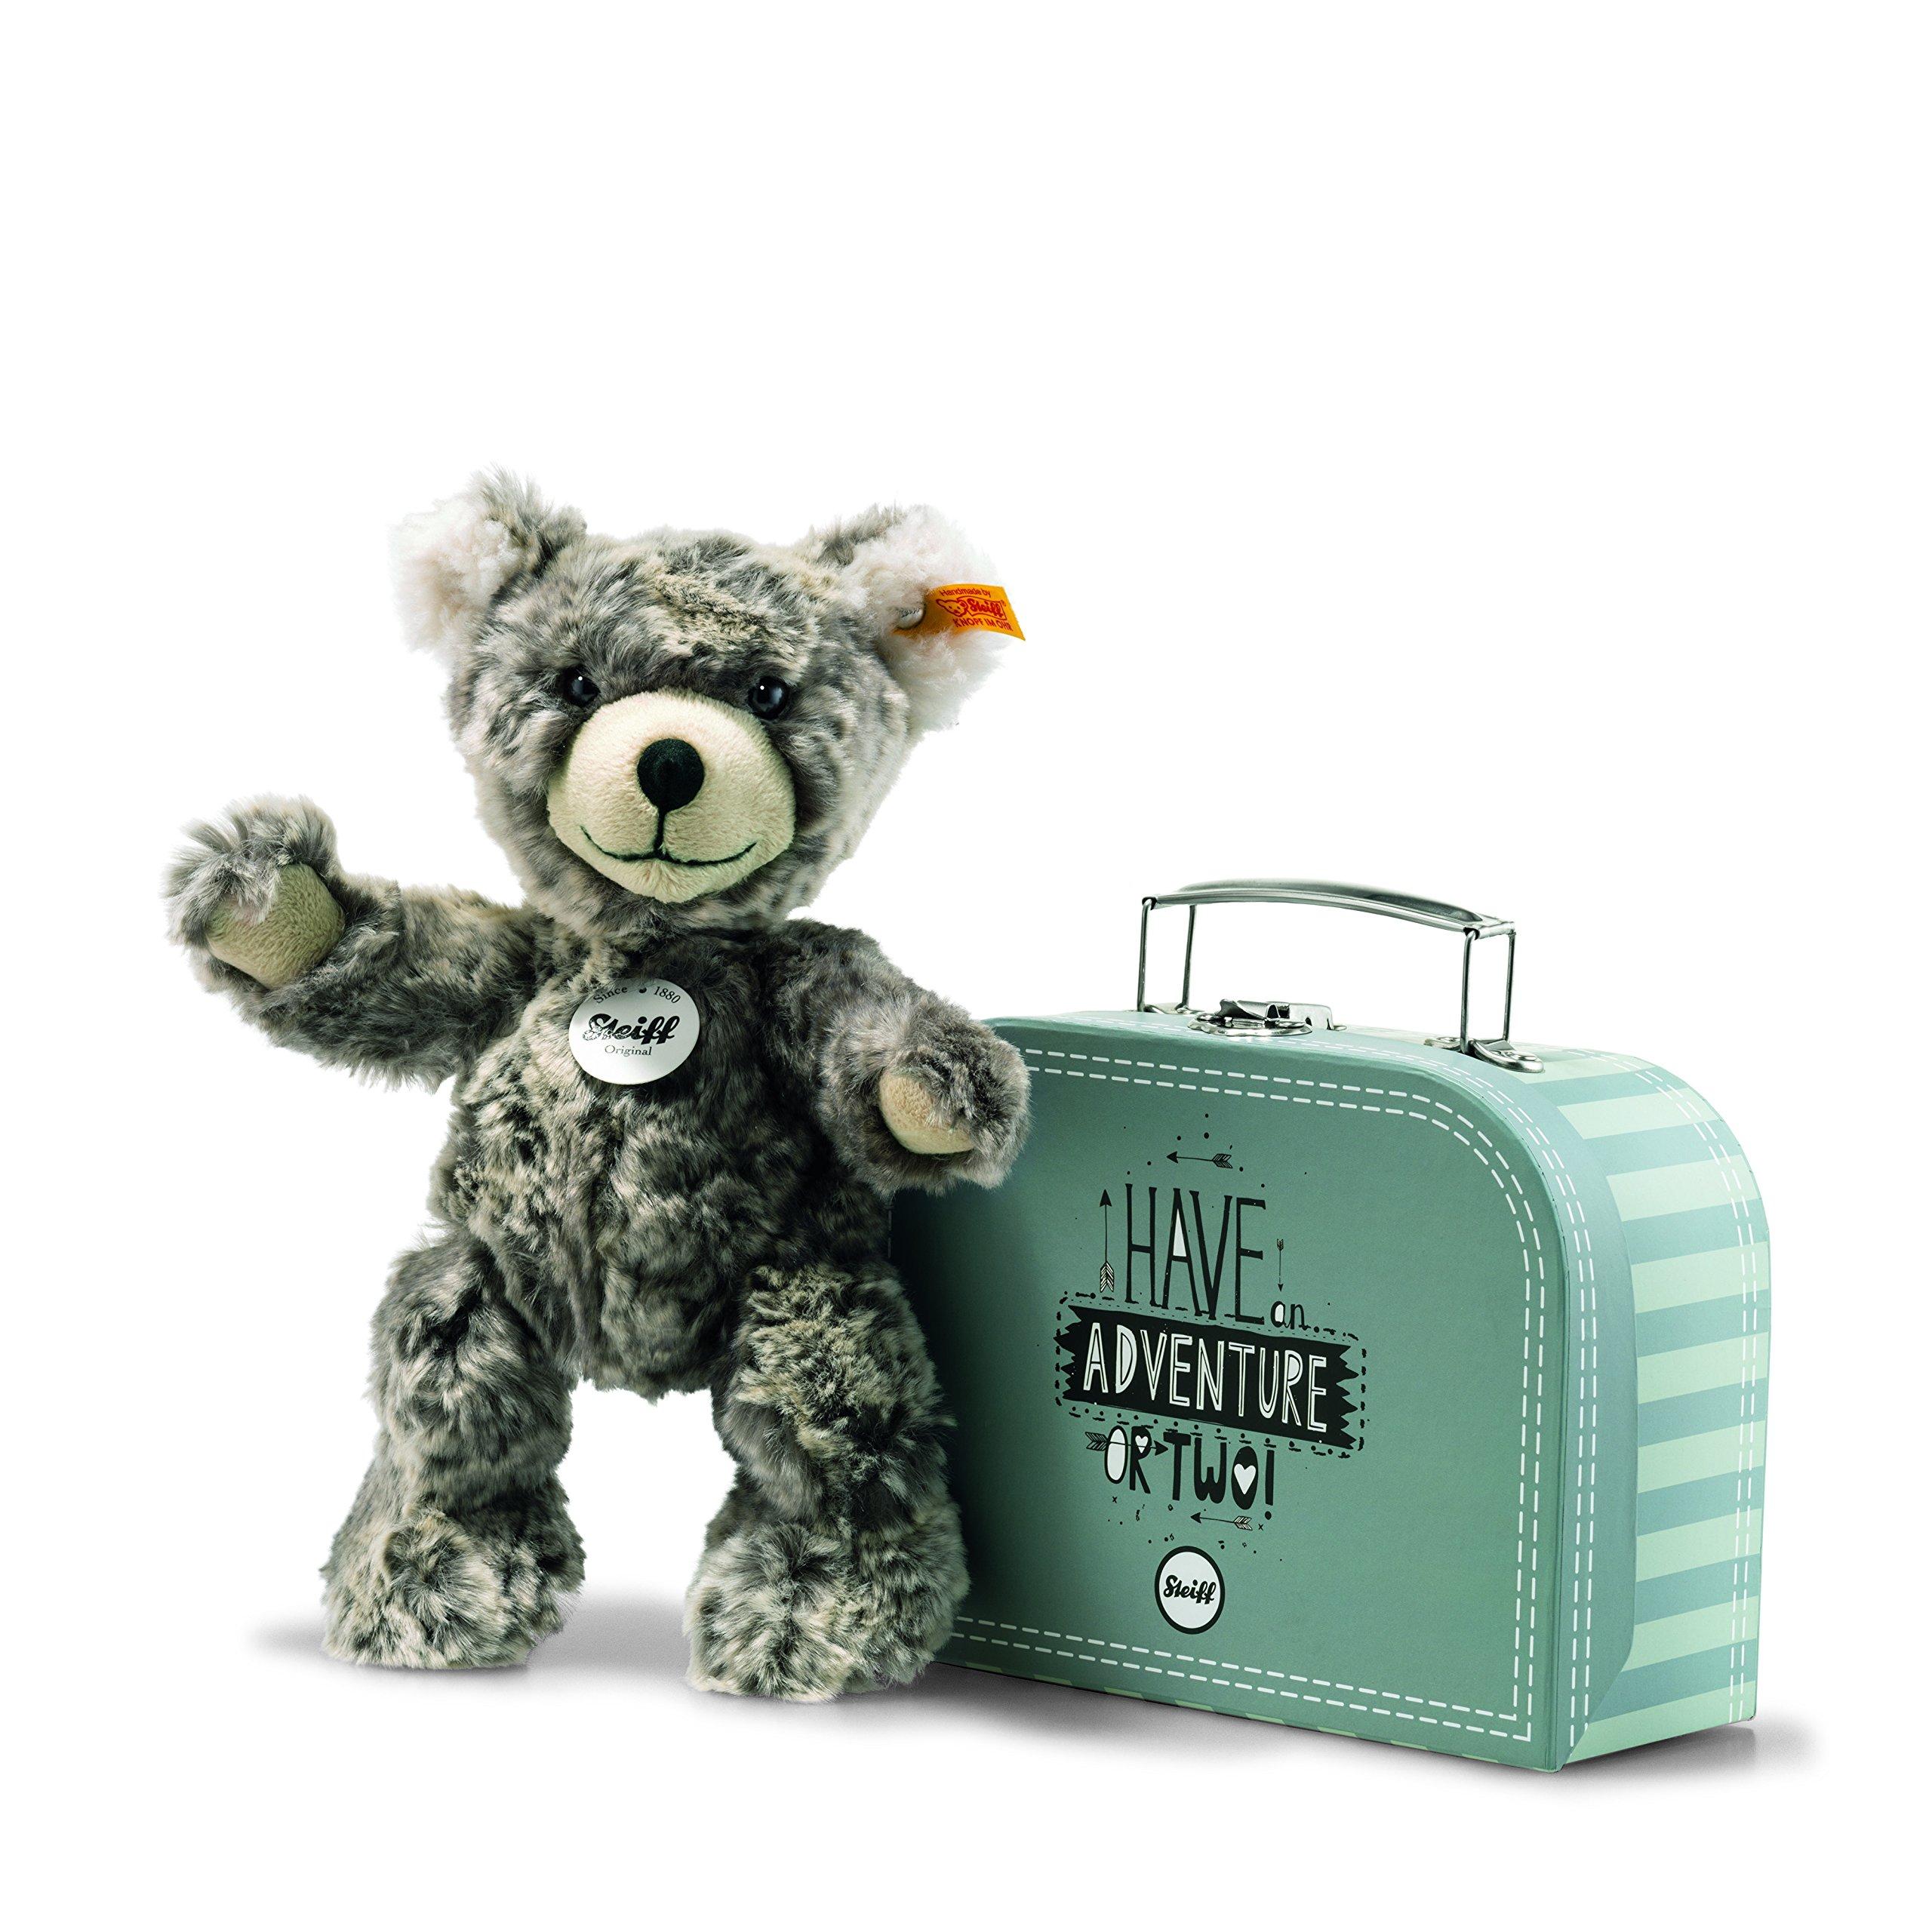 Steiff Lommy Teddy Bear in Suitcase by Steiff